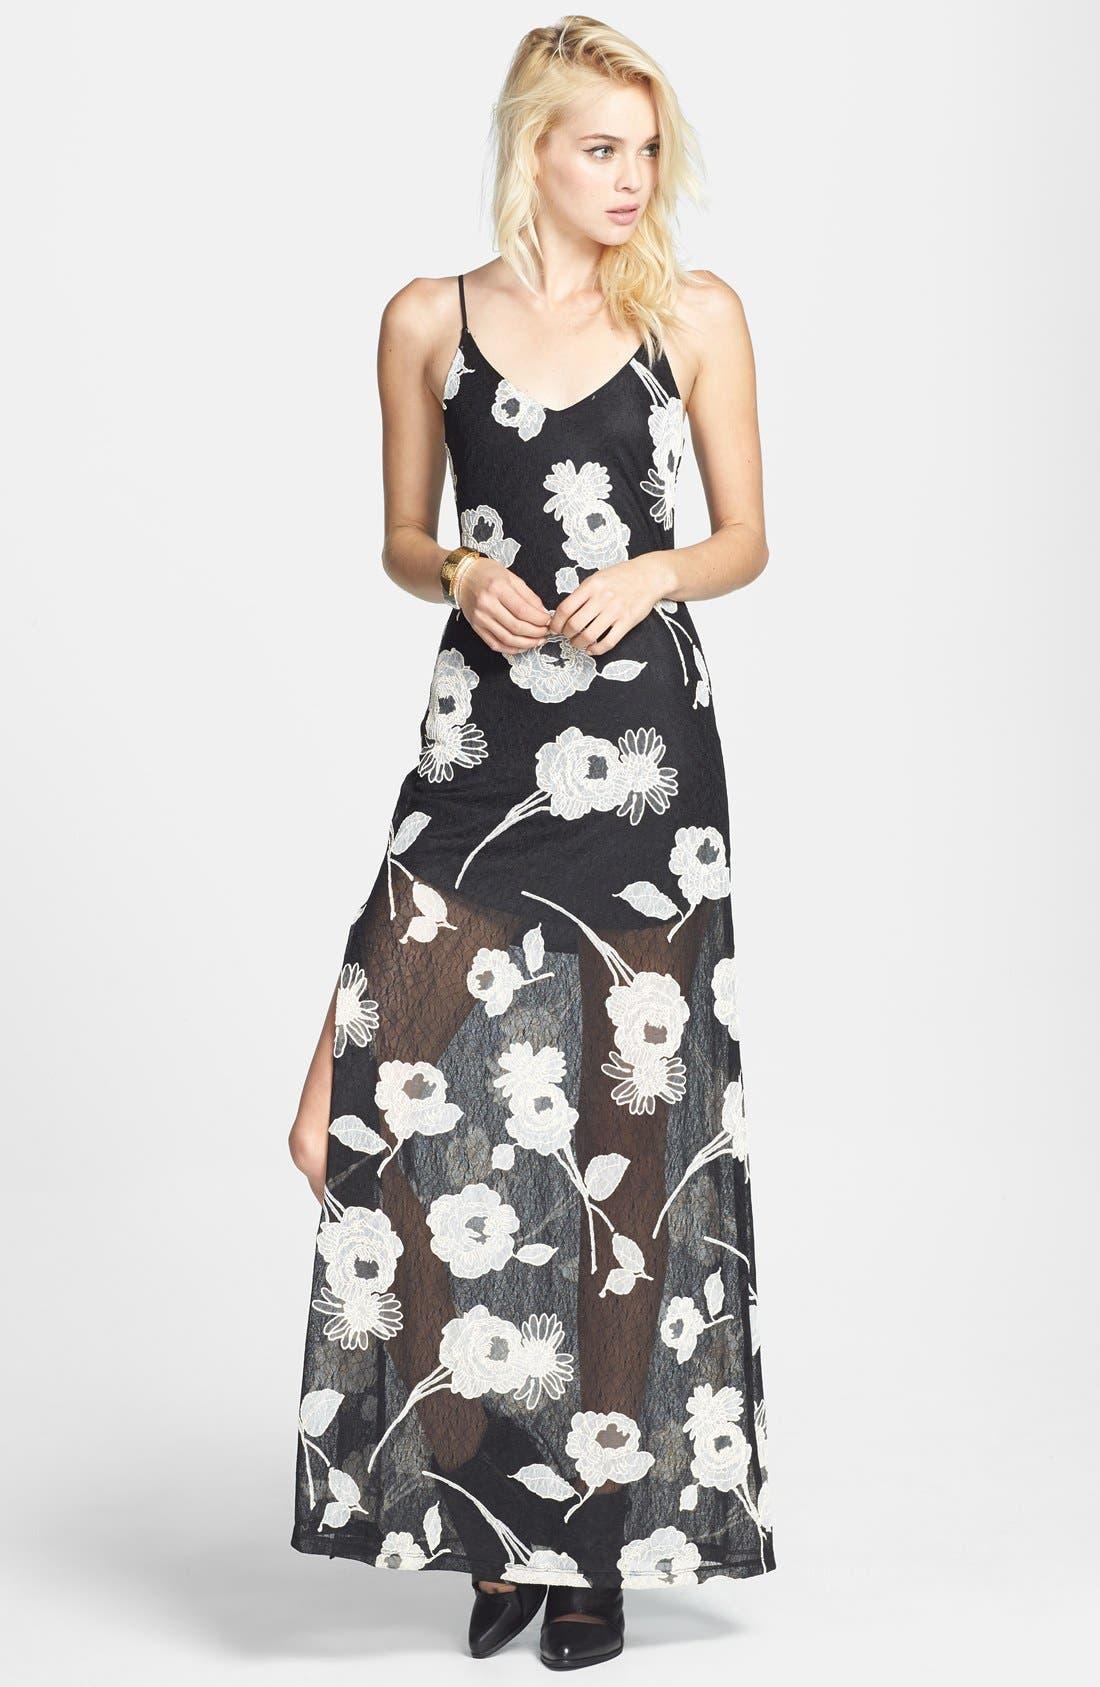 Alternate Image 1 Selected - ASTR Floral Appliqué Lace Maxi Dress (Nordstrom Exclusive)